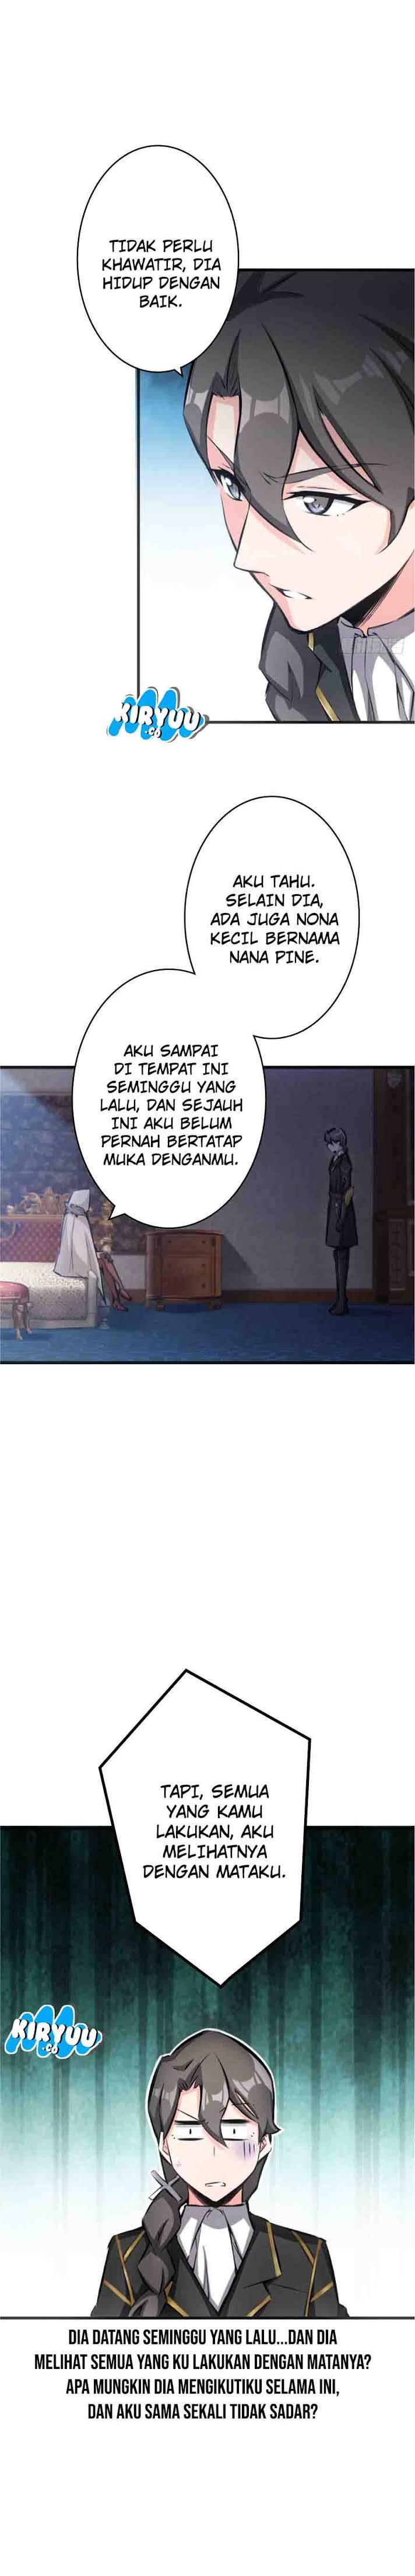 Dilarang COPAS - situs resmi www.mangacanblog.com - Komik release that witch 016 - chapter 16 17 Indonesia release that witch 016 - chapter 16 Terbaru 10 Baca Manga Komik Indonesia Mangacan